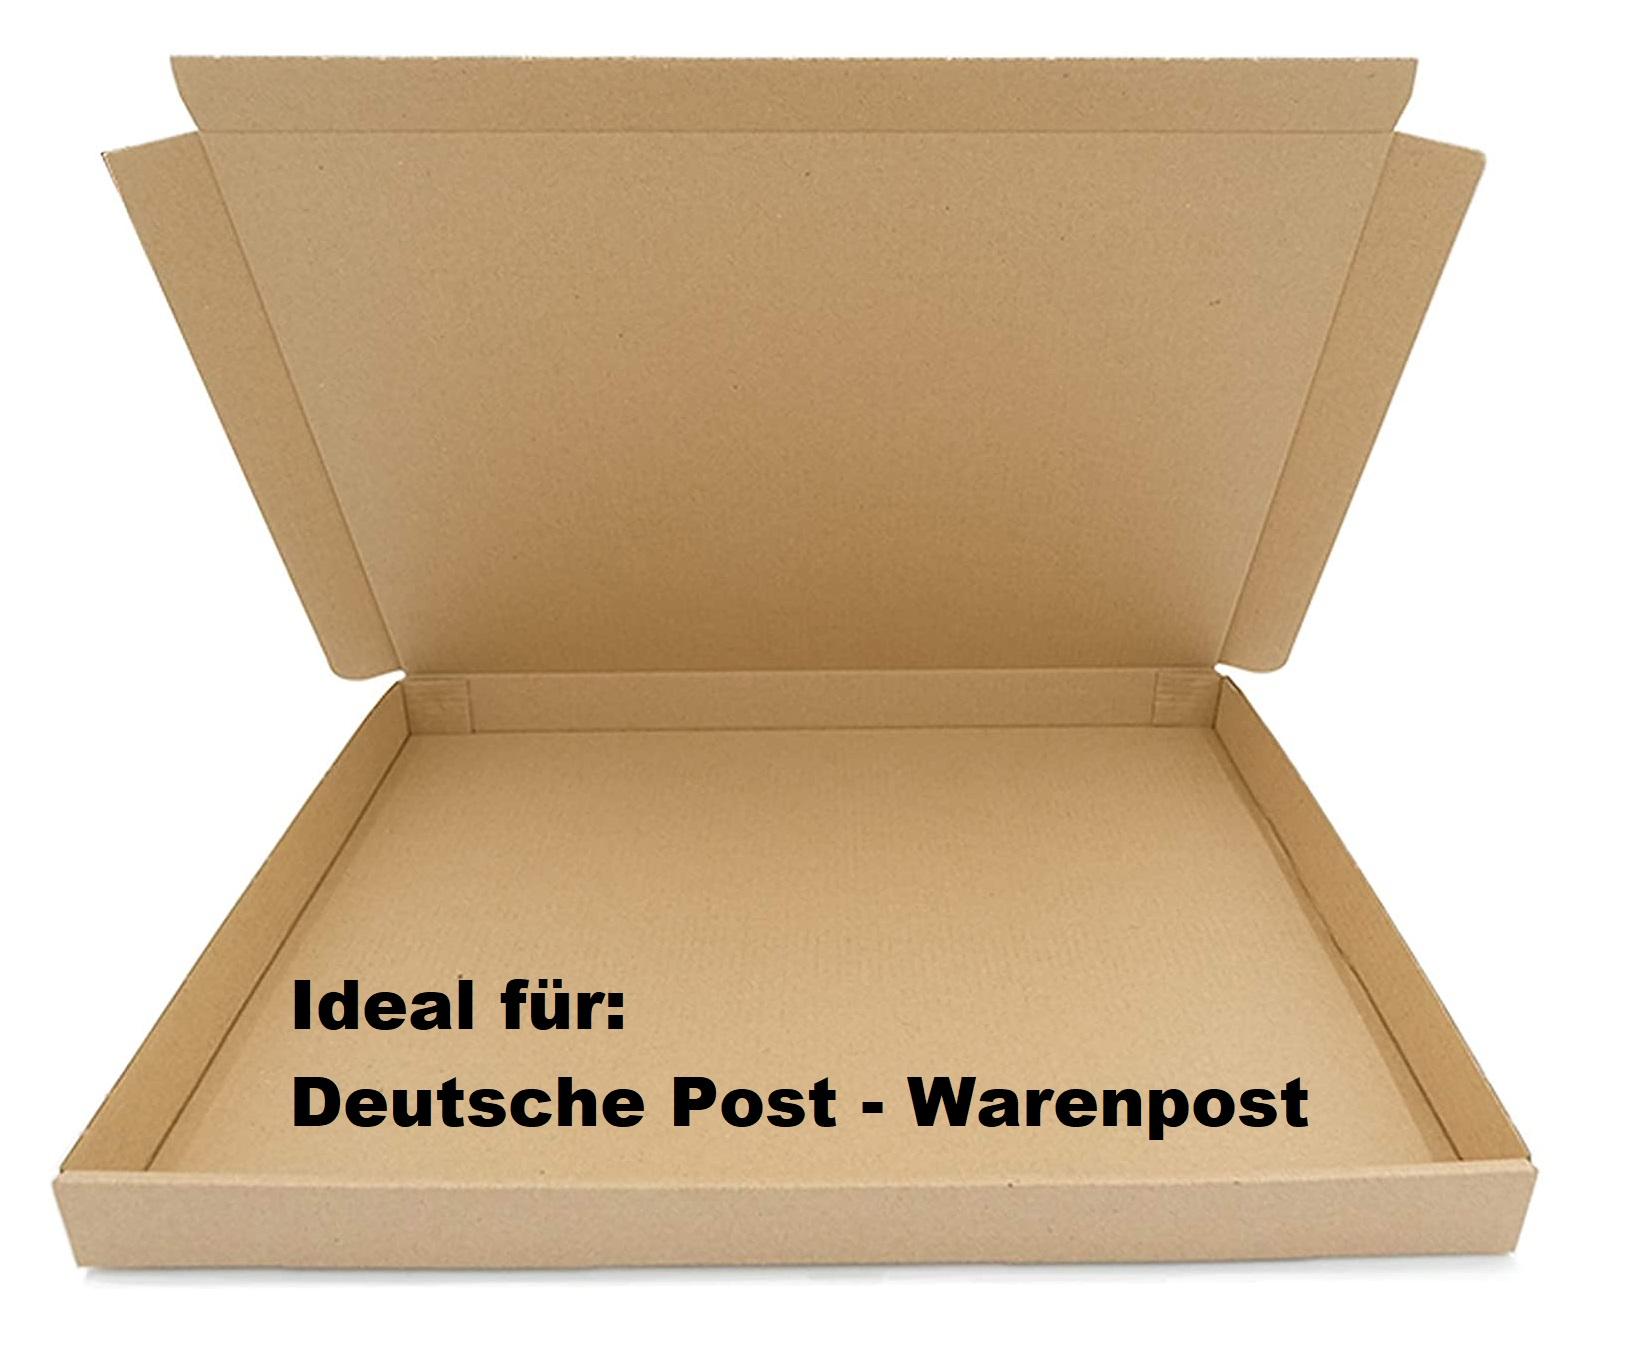 SAD Warenpostkartons 350x250x30mm Postkarton für Warenpost International XS geeignet - DIN A4 Format